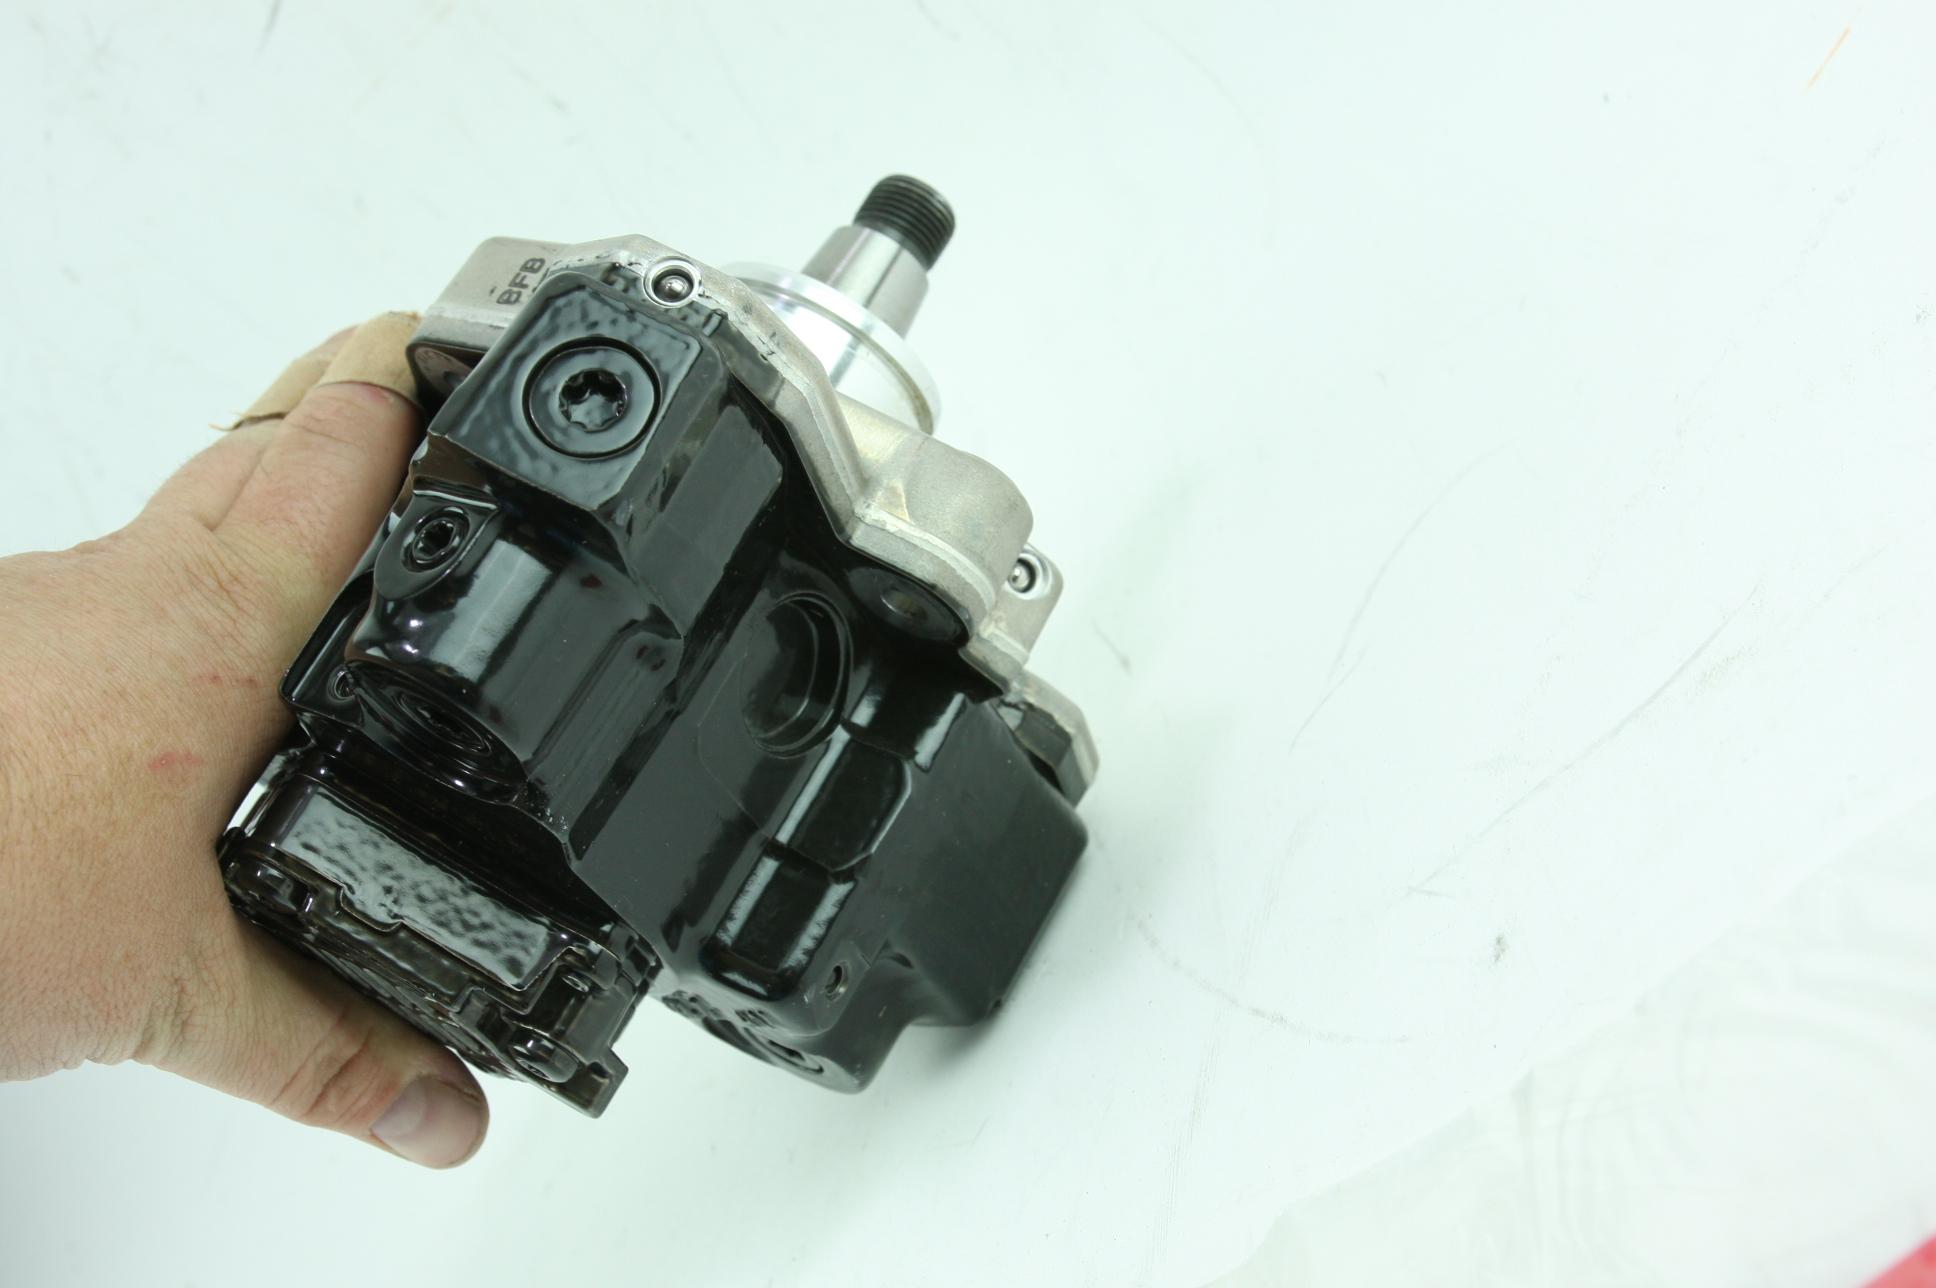 New Genuine OEM GM 97780161 Reman Injection Pump w/ Regulator 06-10 Duramax 6.6 - image 7